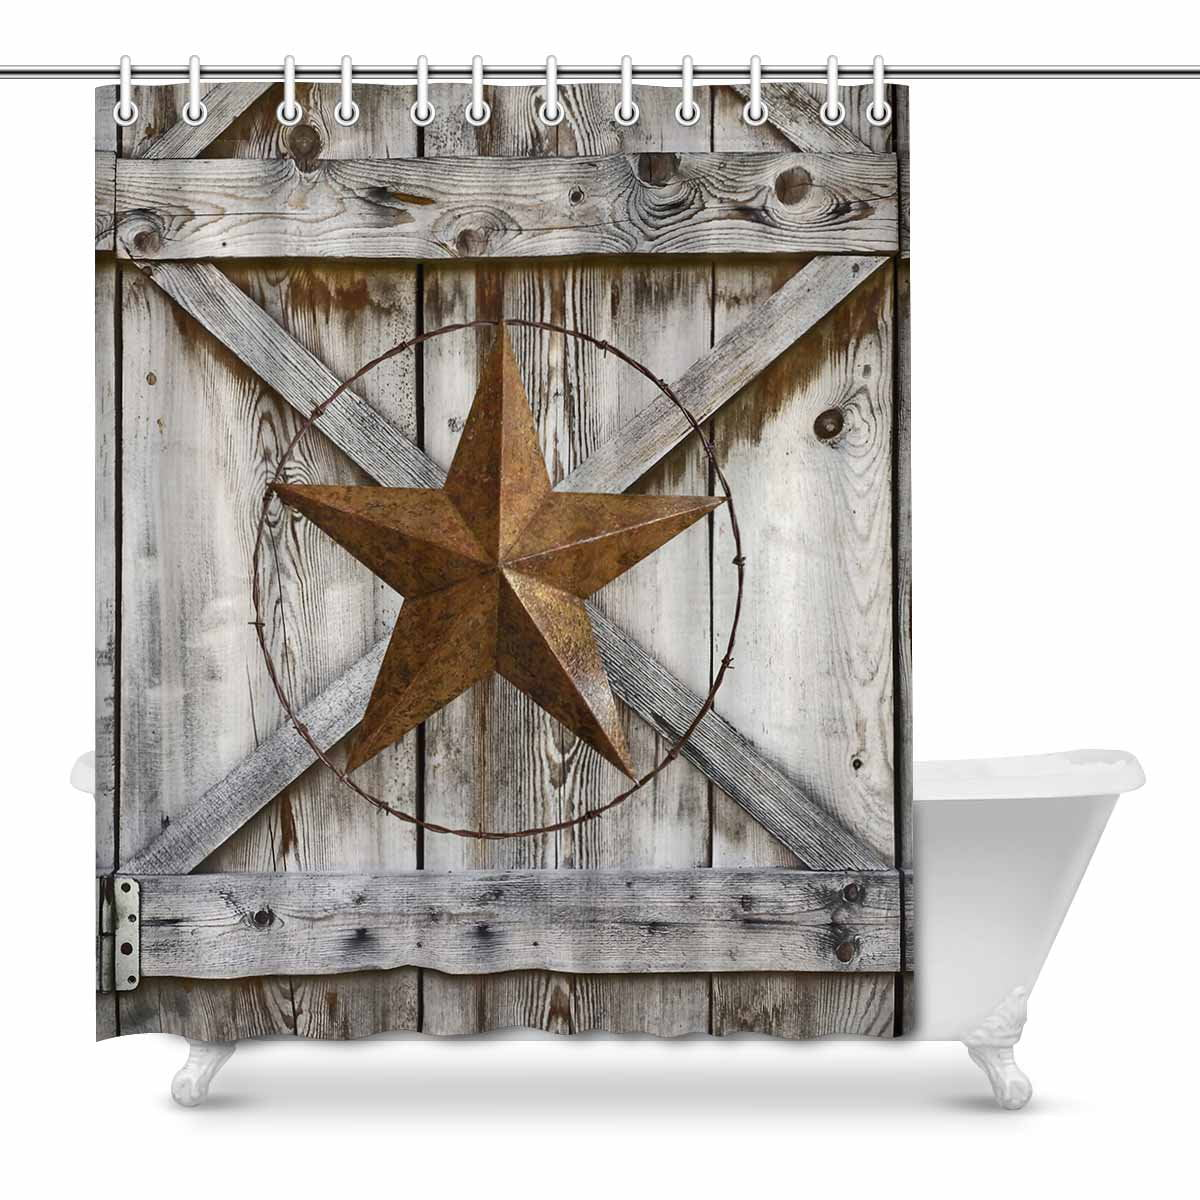 mkhert western texas star on rustic old barn wood waterproof shower curtain decor fabric bathroom set 66x72 inch walmart com